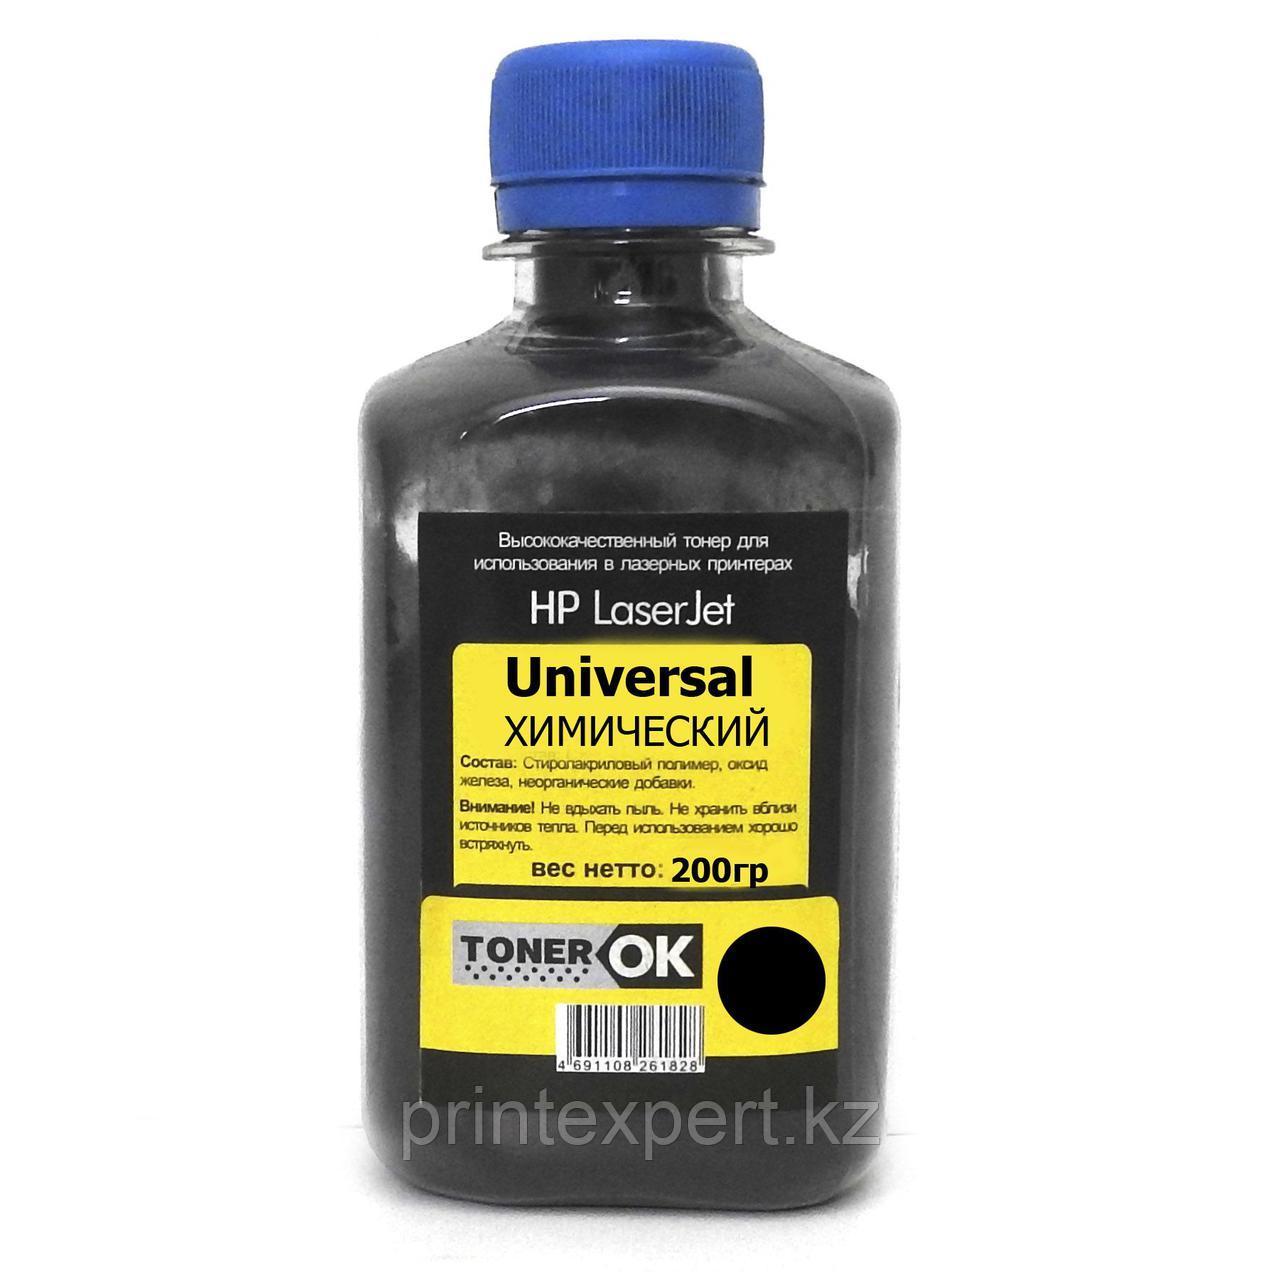 Тонер Toner OK для HP CLJ Universal ХИМИЧЕСКИЙ Black (200гр)